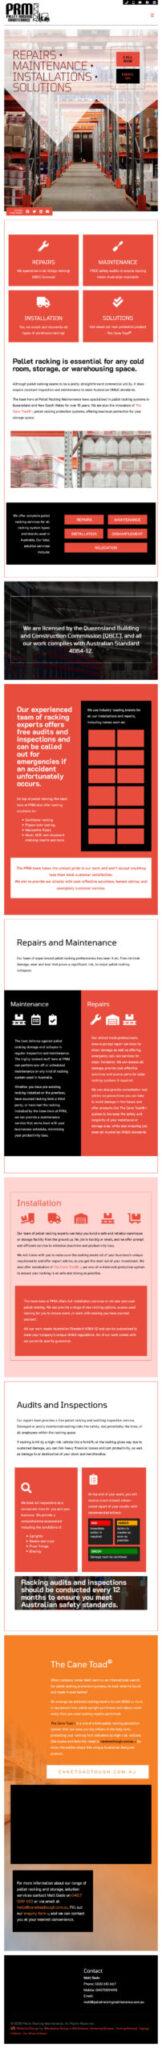 Pallet Racking Maintenance: Mobile View